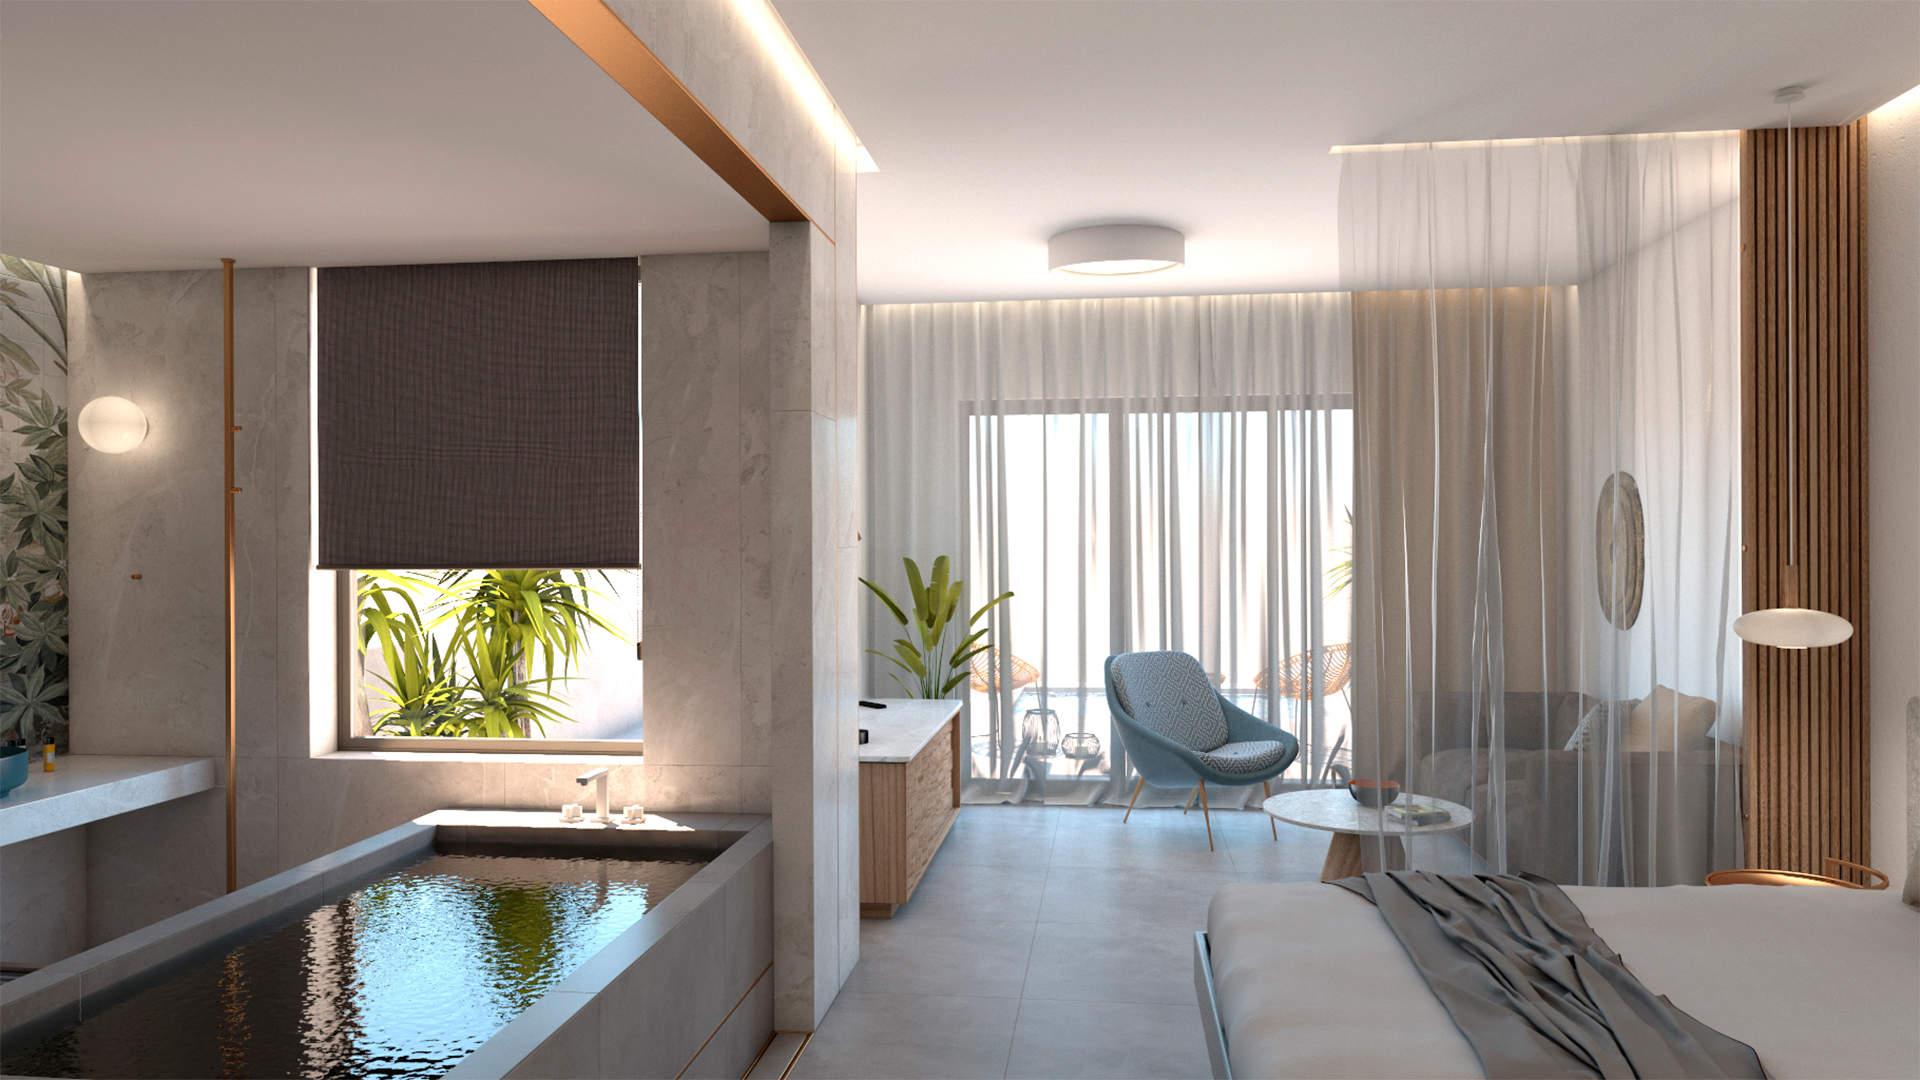 Luxury suite, interior design, indoor Jacuzzi, bed, living room Πολυτελής σουίτα, σχεδιασμός και διακόσμηση, εσωτερικό τζακούζι, κρεβατοκάμαρα, καθιστικό.